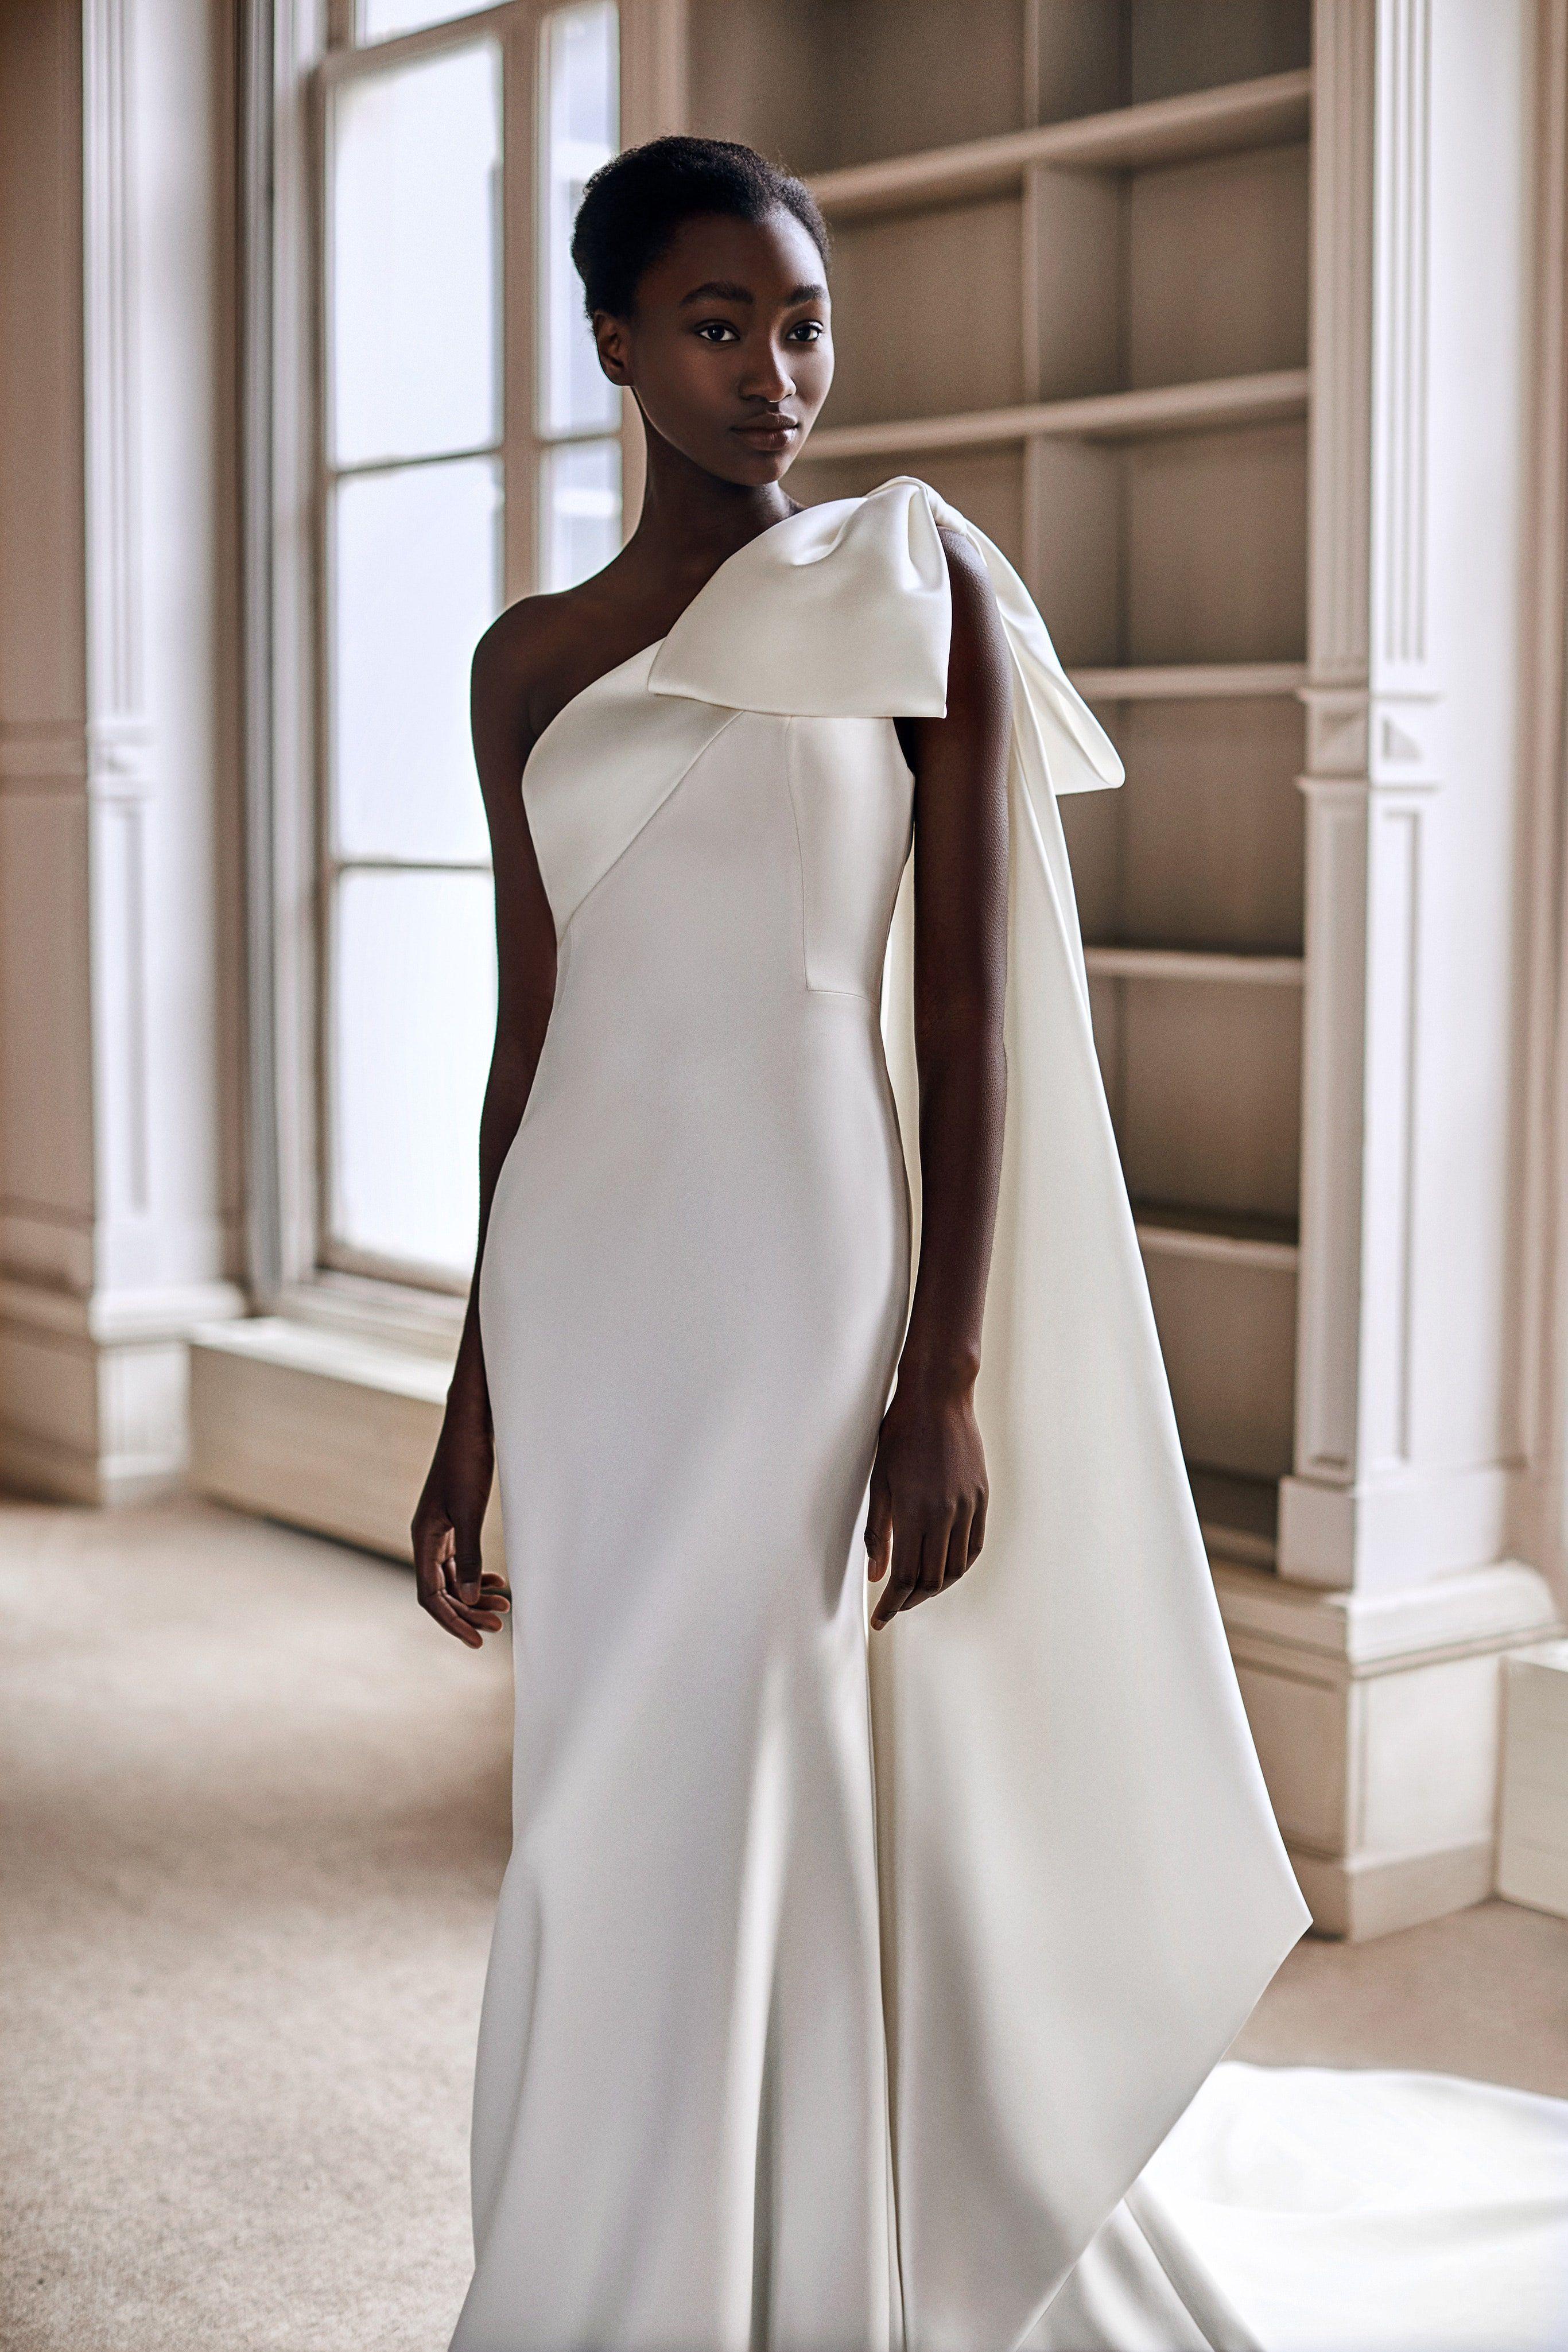 Minimalism Keeping It Simple Wedding Dress Trends Bridal Fashion Week Wedding Dresses [ 4098 x 2732 Pixel ]